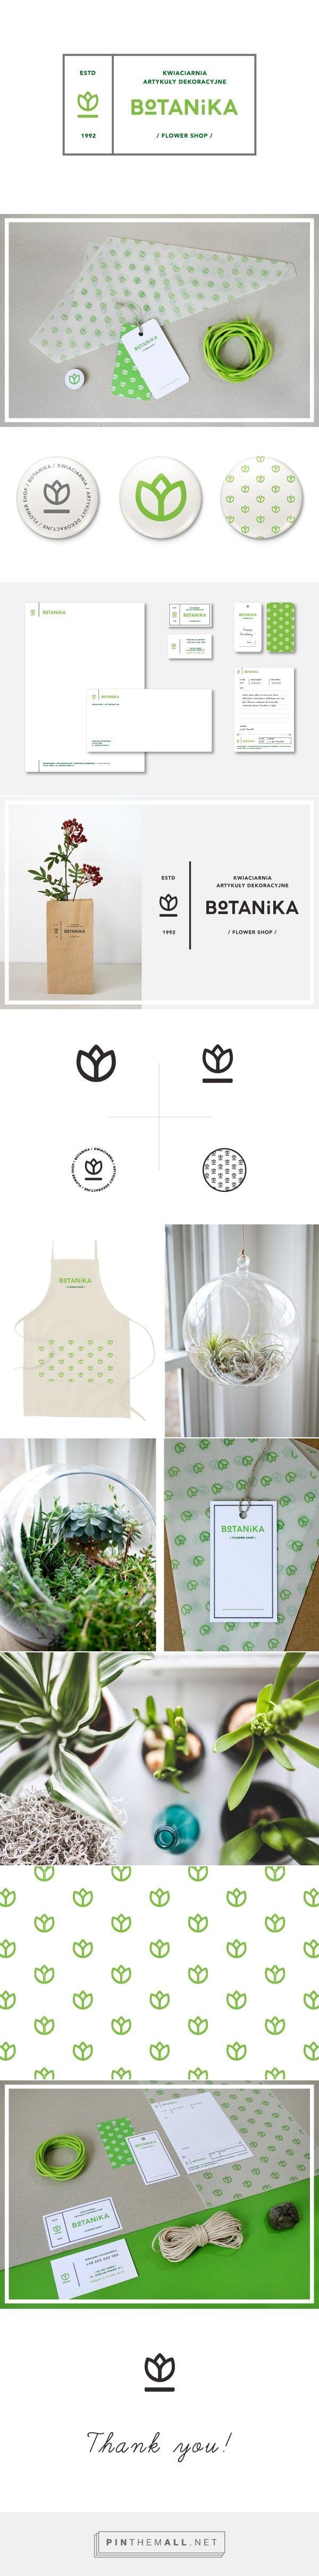 Botanika Flower Shop by Rita Duczmańska   Fivestar Branding Agency – Design and Branding Agency & Curated Inspiration Gallery  #designinspiration #floristbranding #branding #fivestarbrandingagency